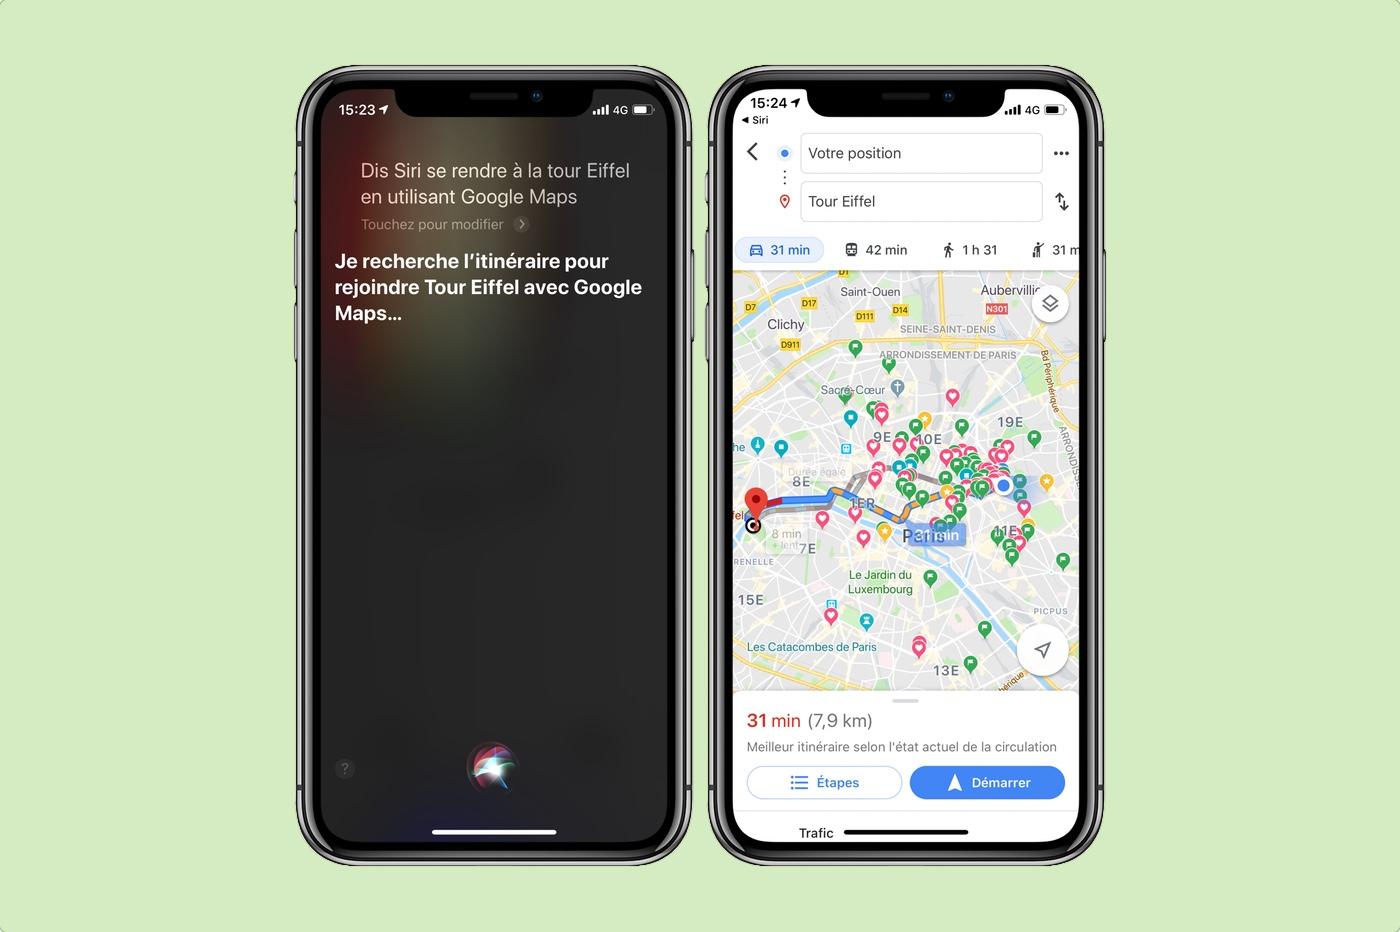 Utiliser Siri avec Google Maps sous iOS 13